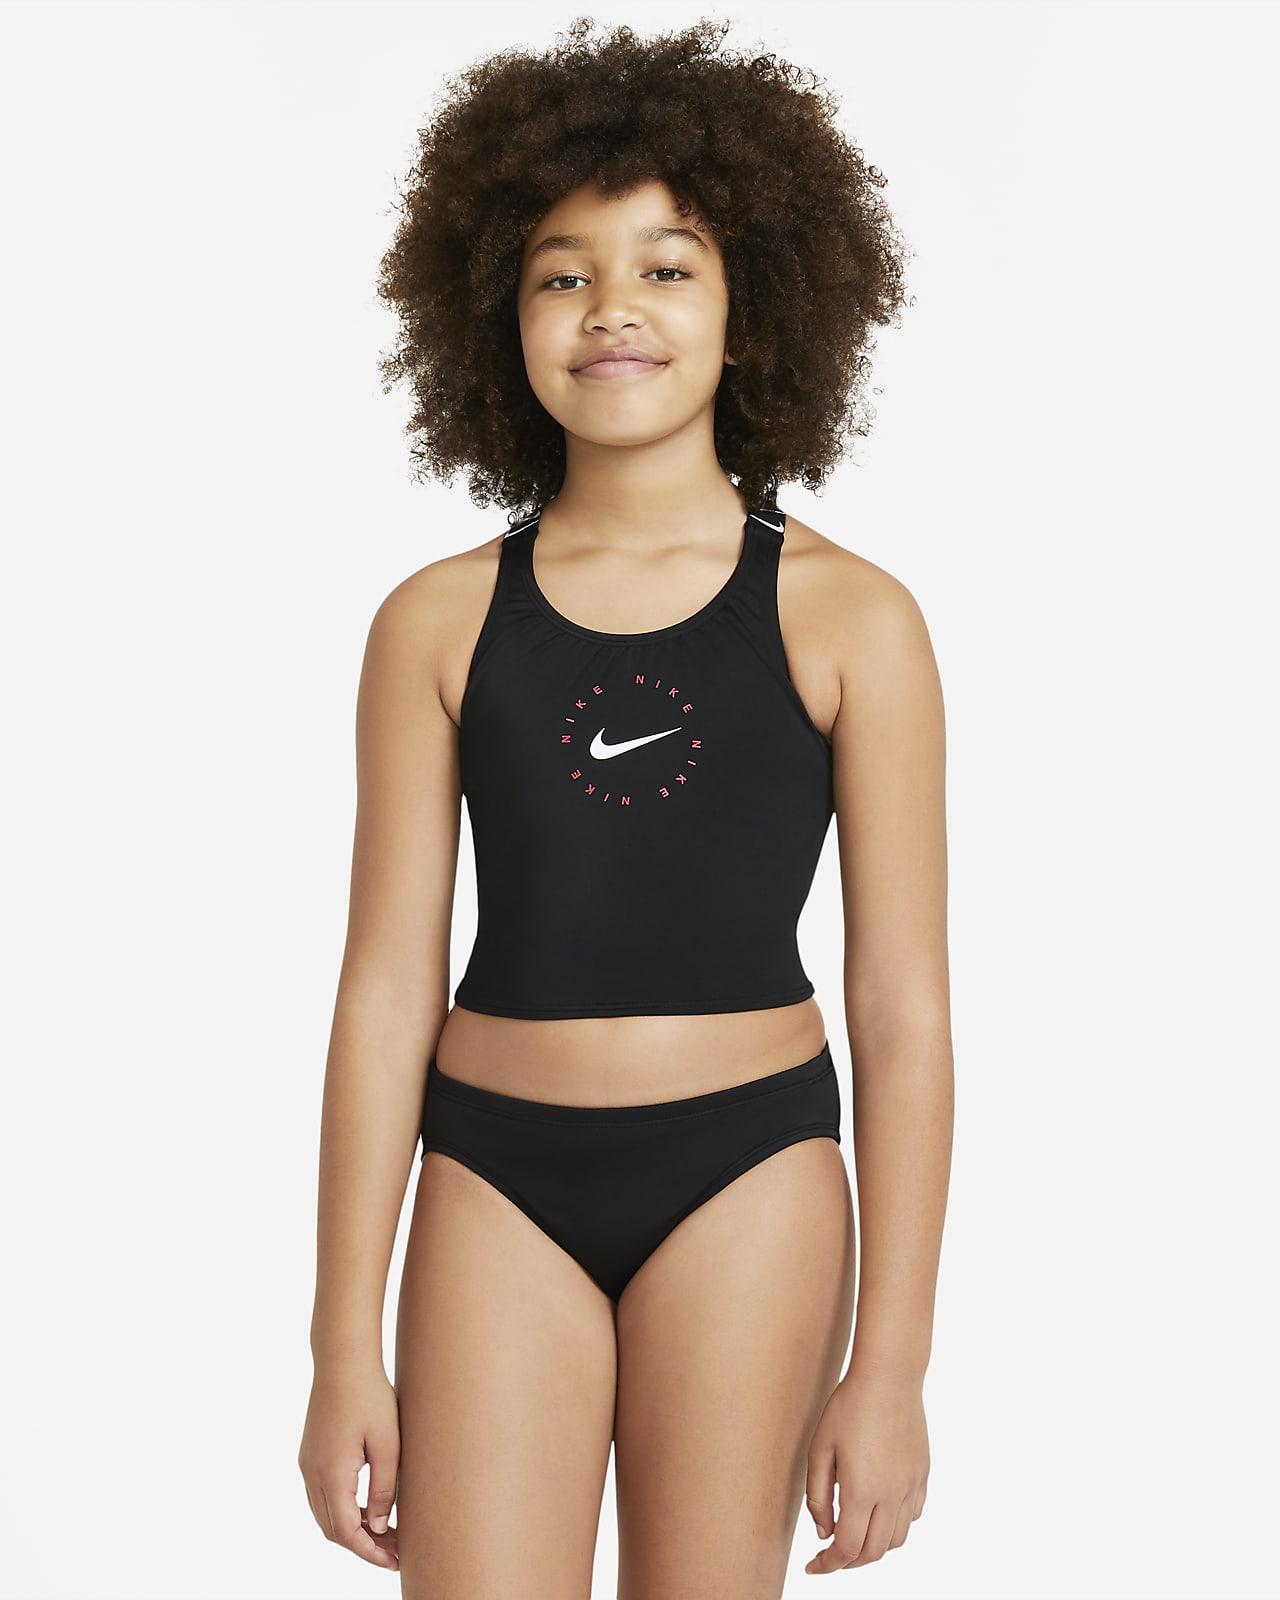 Nike Big Kids' (Girls') Crossback Midkini Set